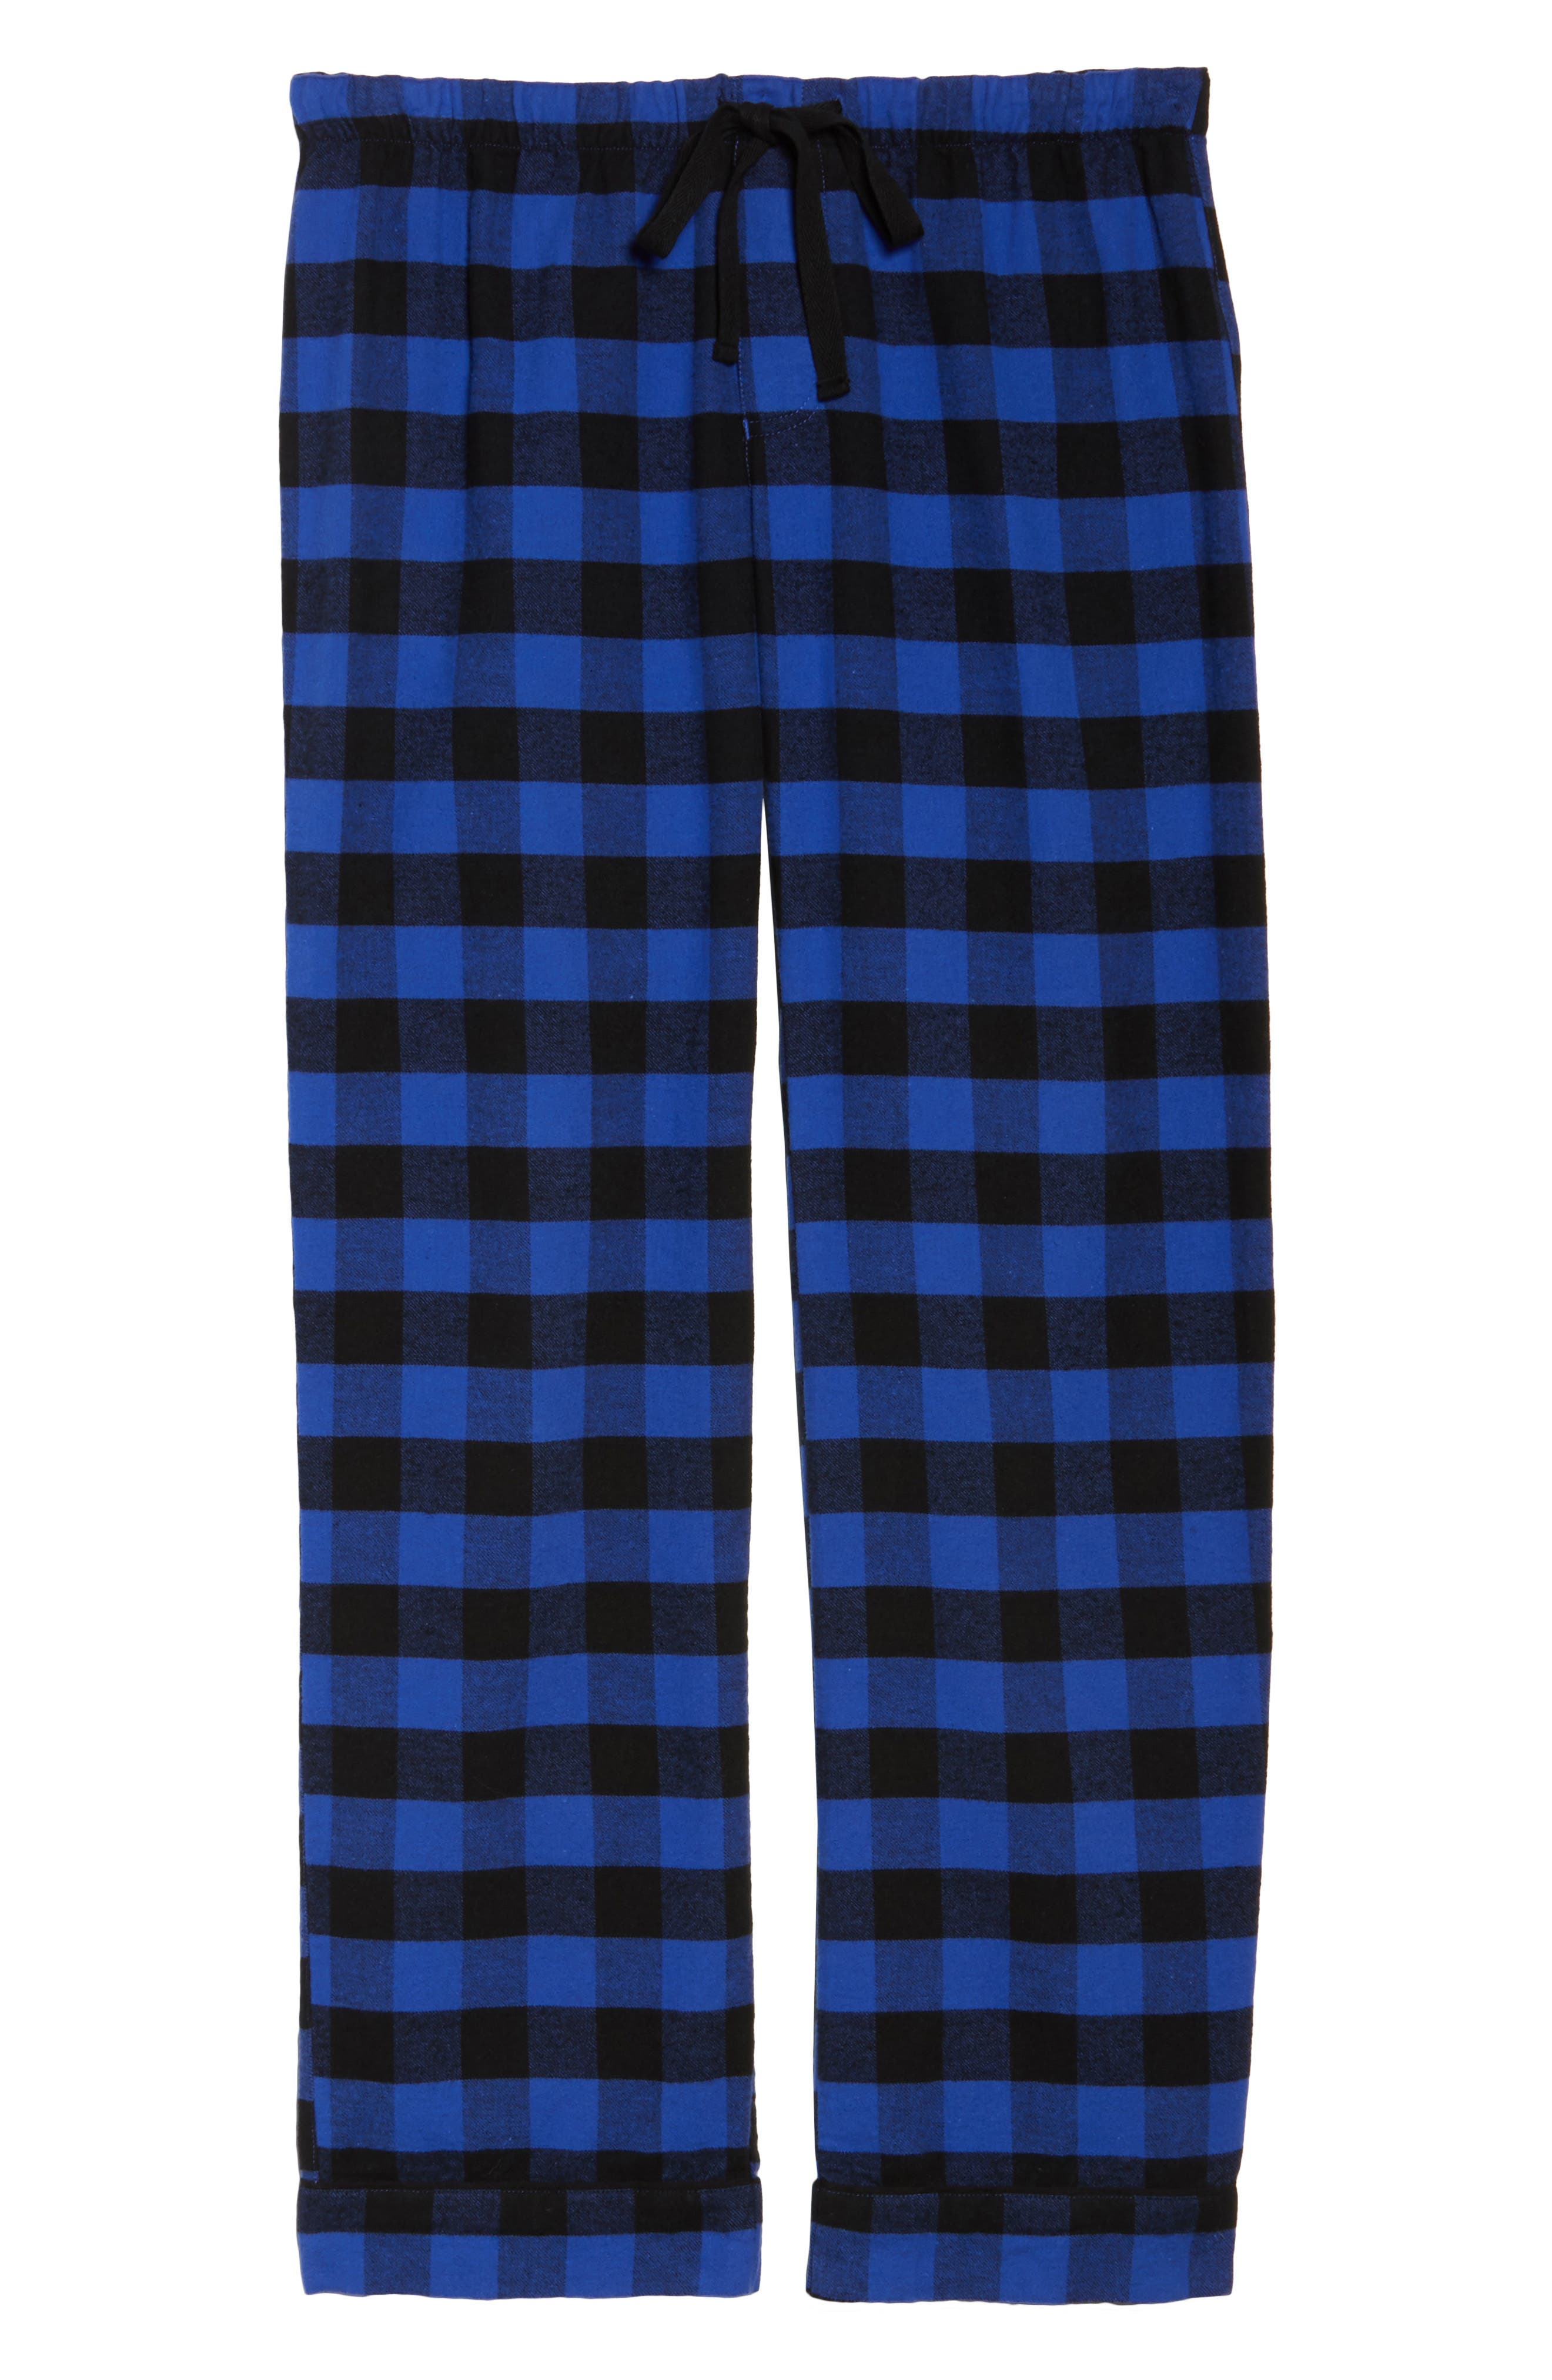 Pajama Pants,                             Alternate thumbnail 7, color,                             Royal